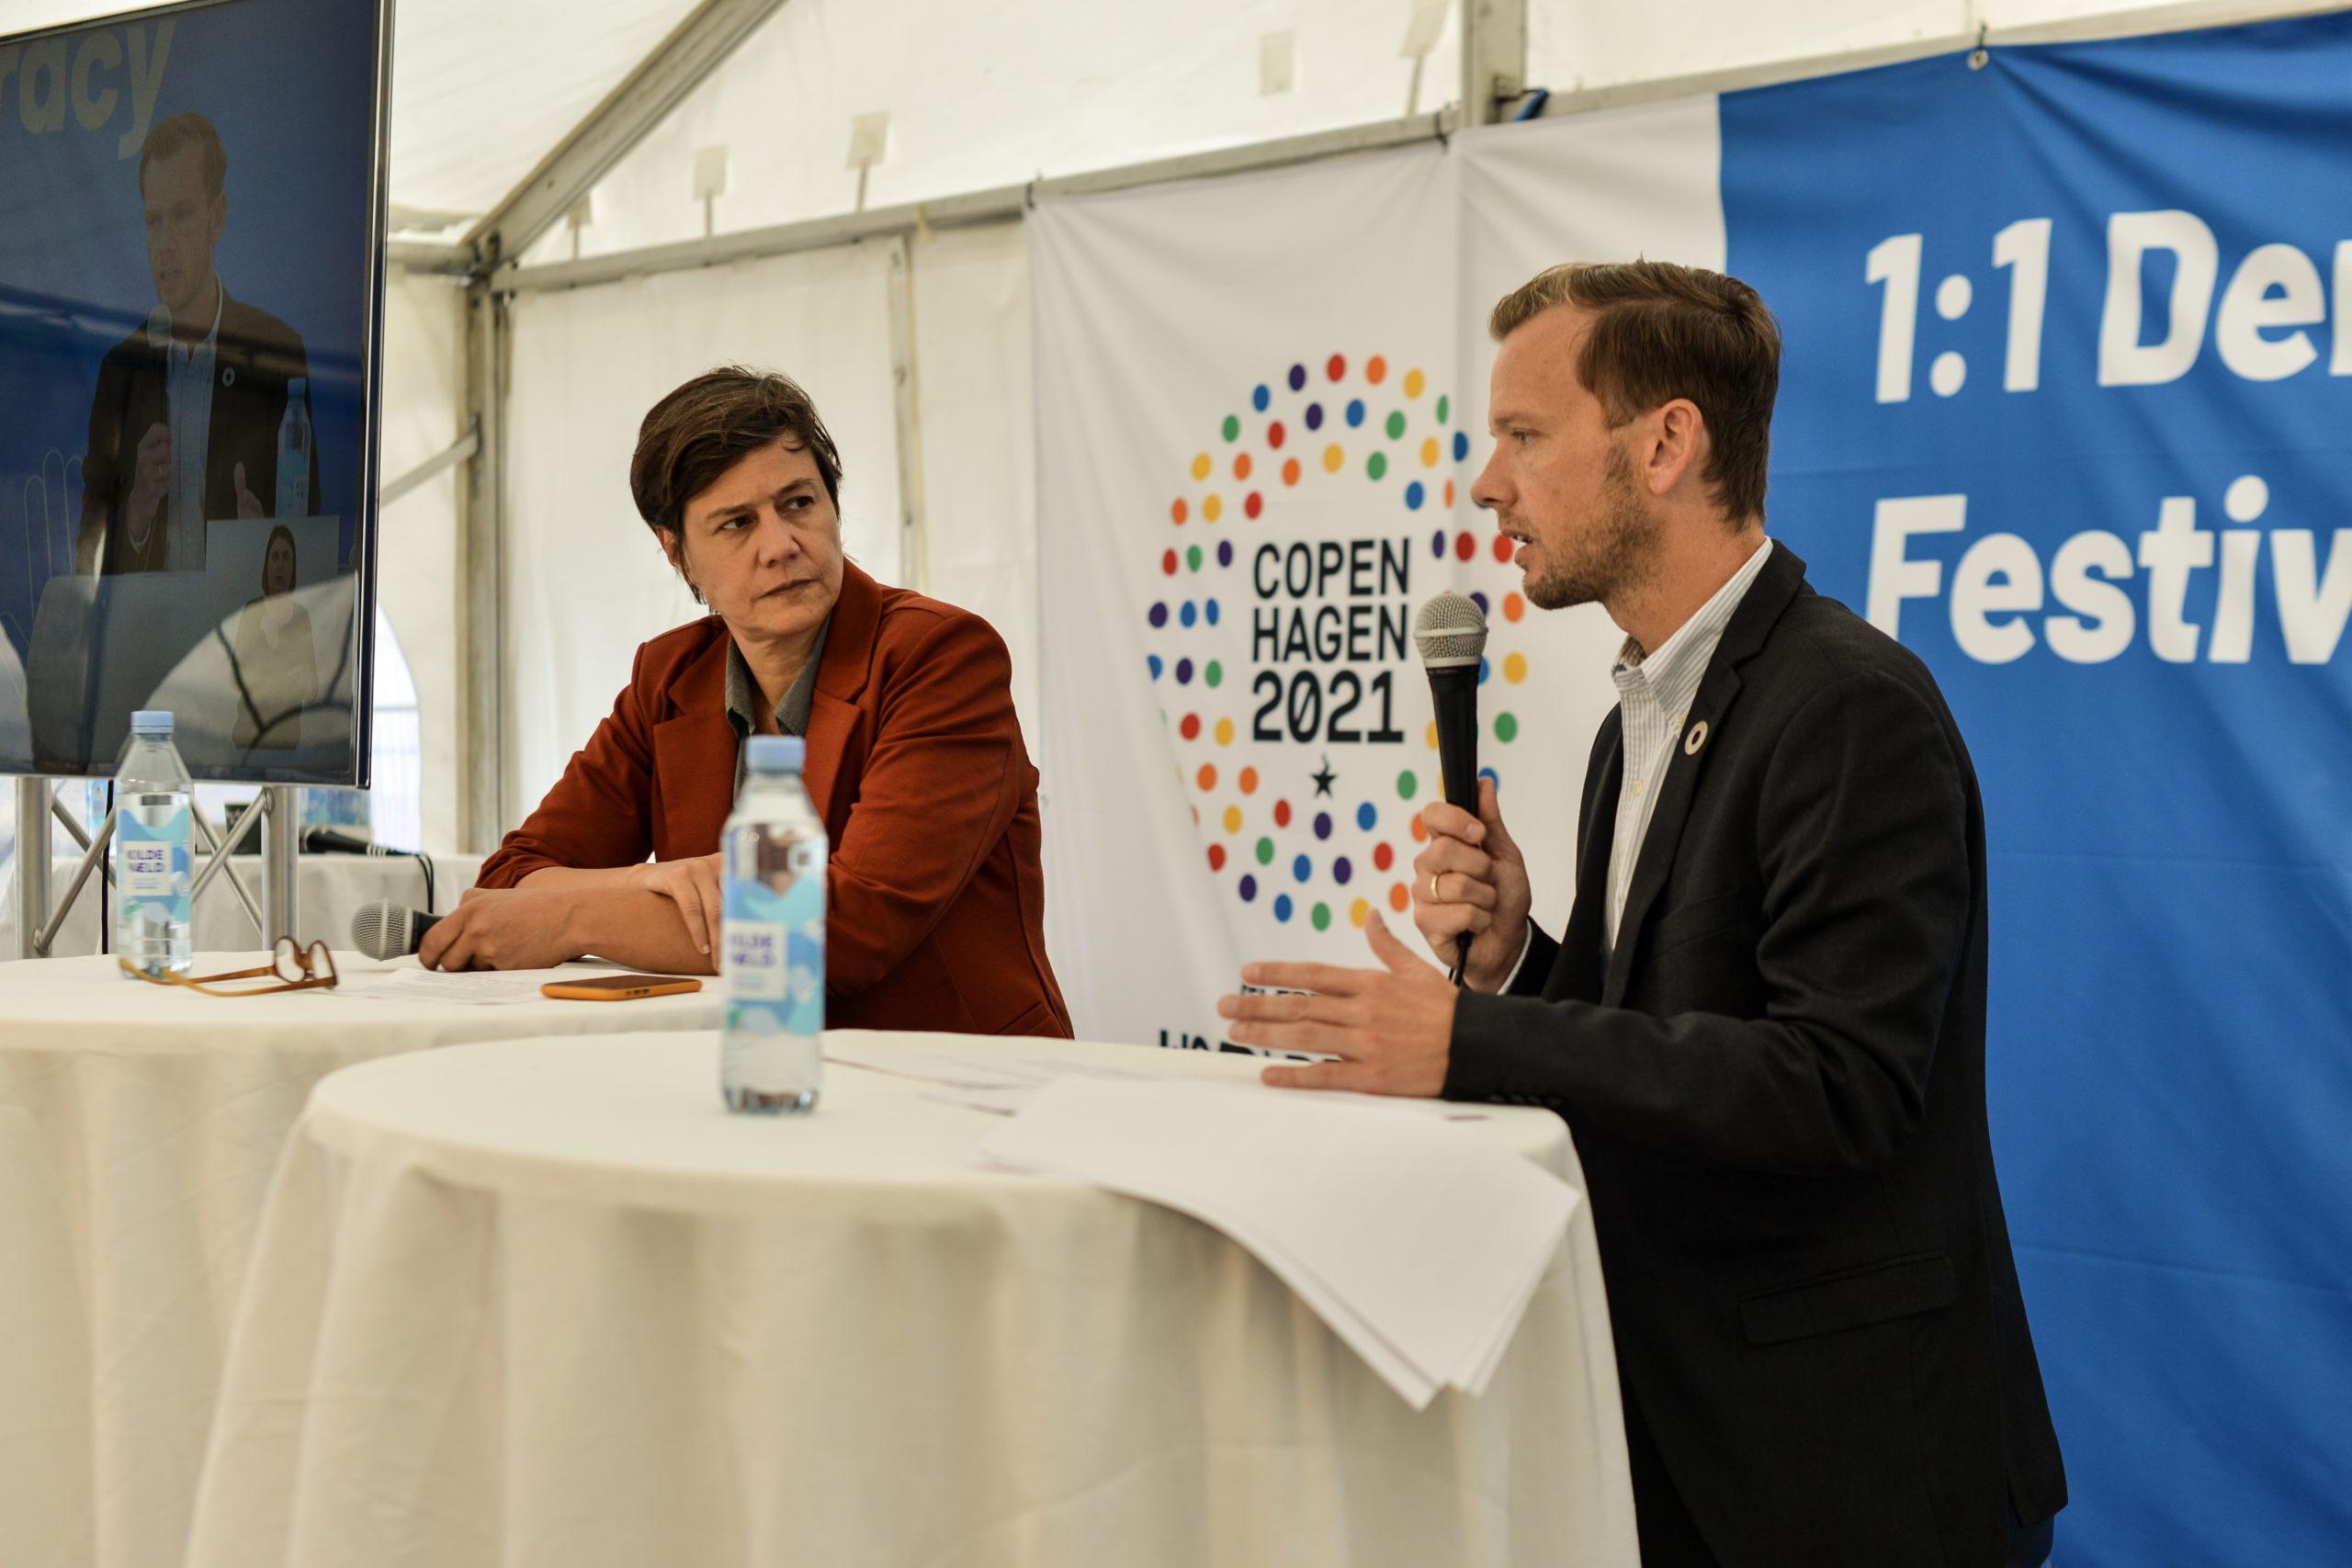 Sekretariatschef Susanne Branner Jespersen i samtale med Ligestillingsminister Peter Hummelgaard